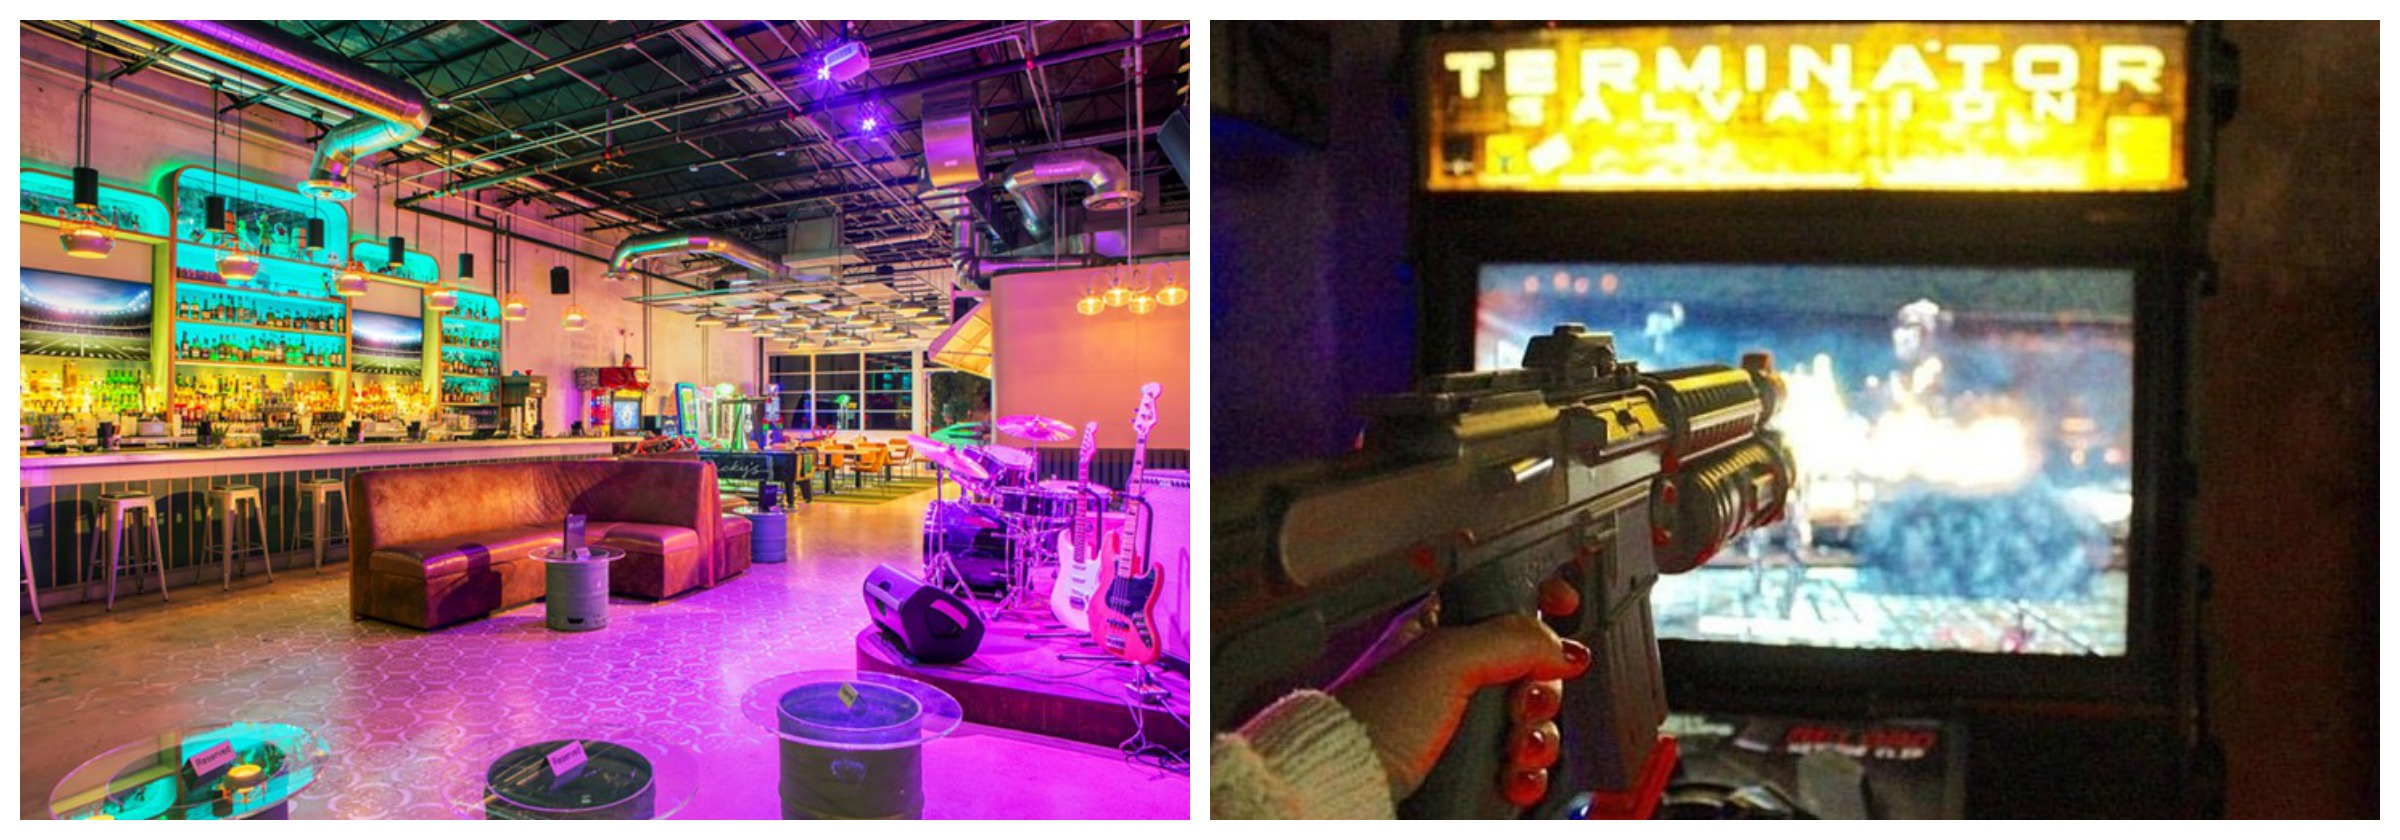 Ricky's Miami Beach Arcade games